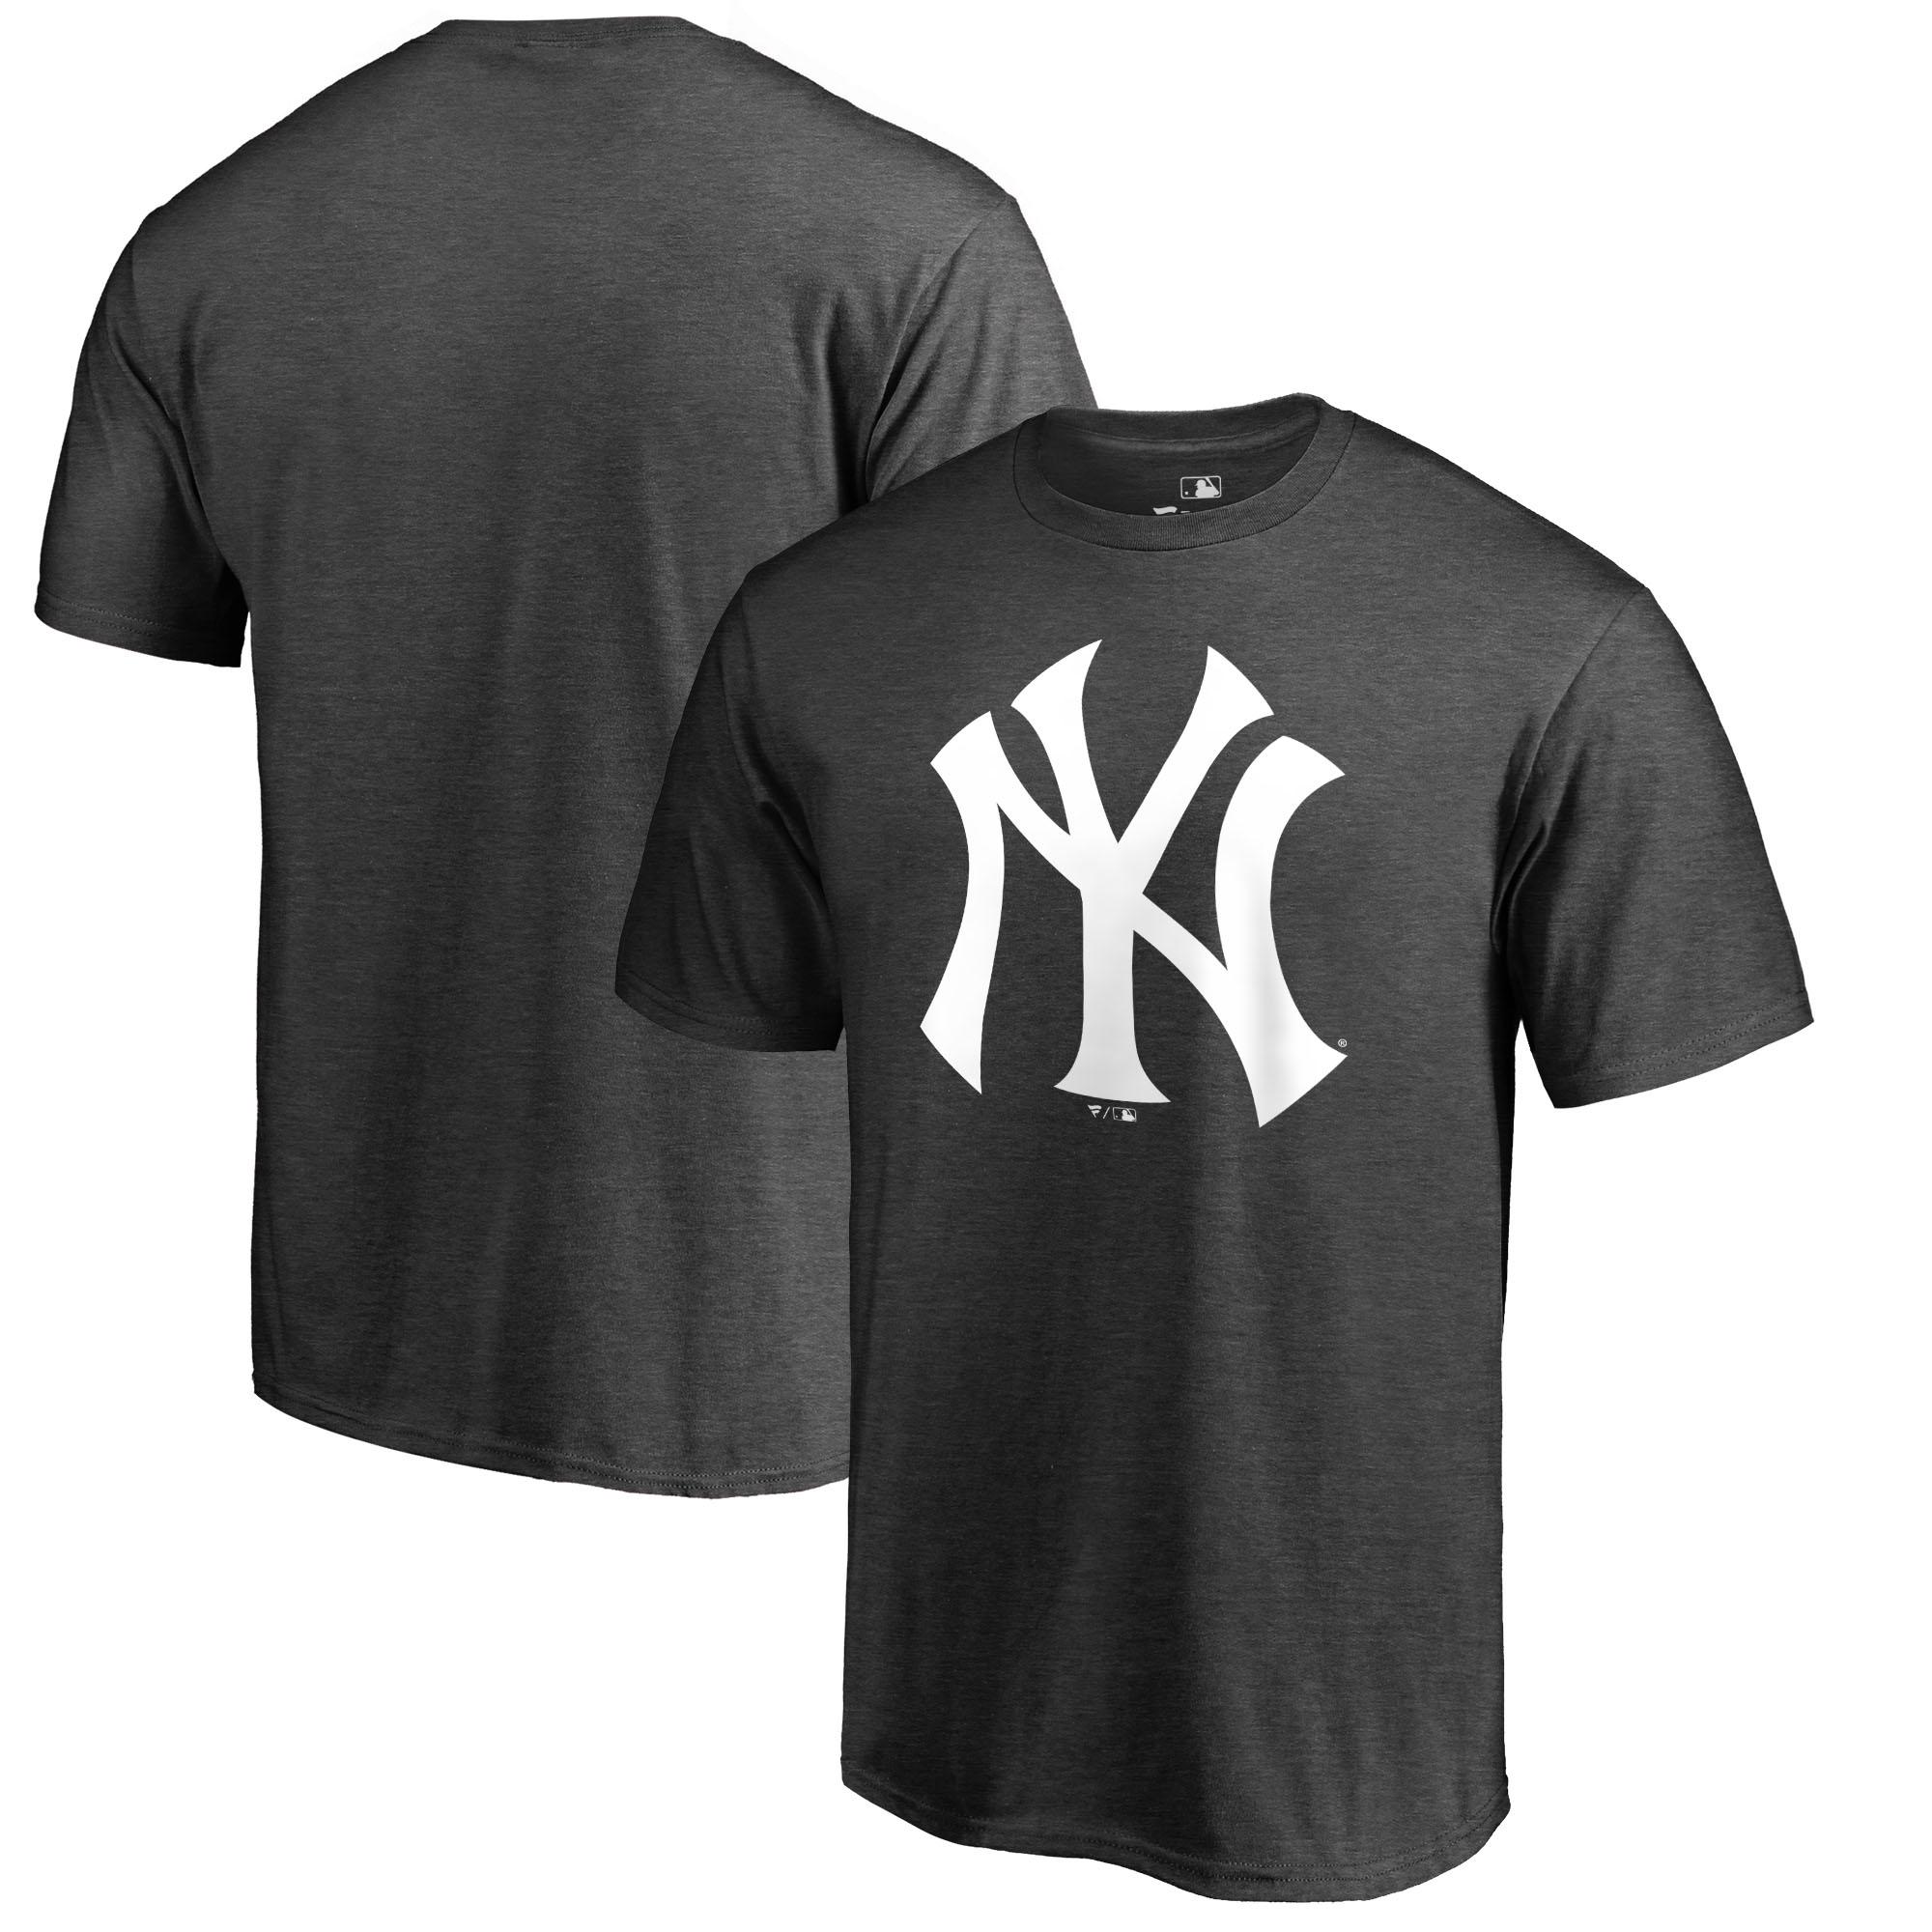 New York Yankees Fanatics Branded Primary Logo T-Shirt - Charcoal